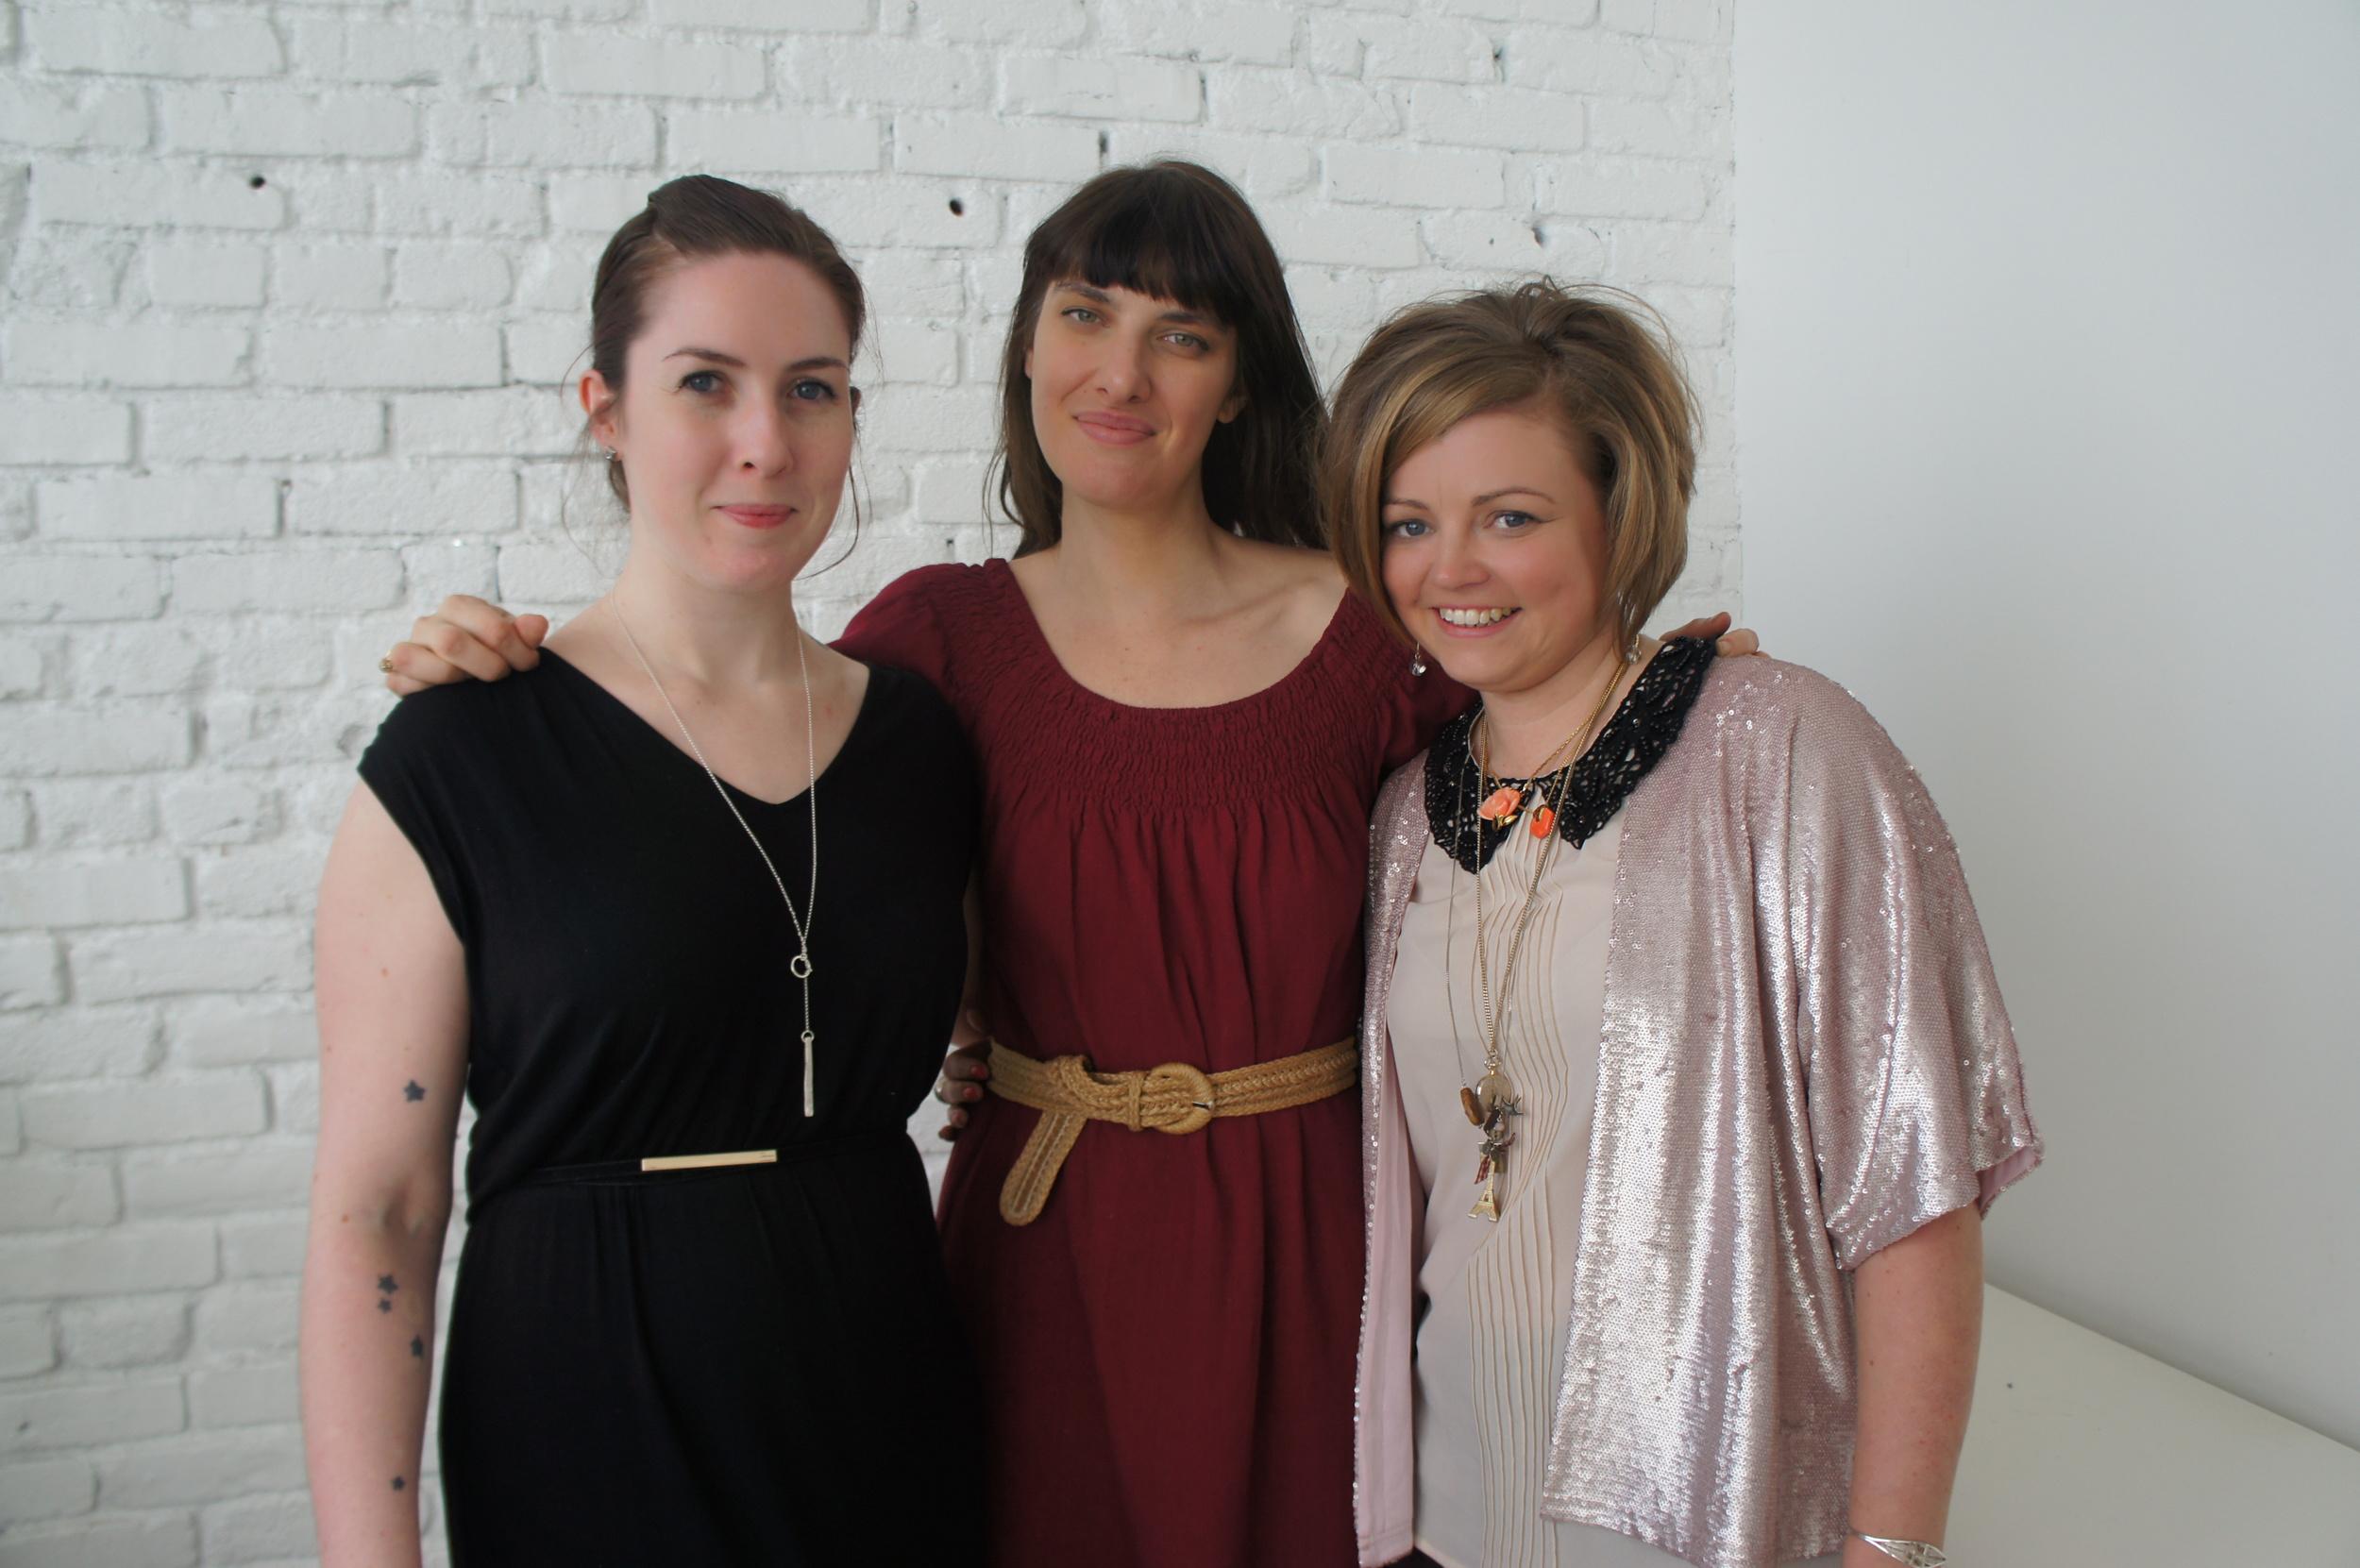 Amy Merrick, Hayley Thomson & Kimberly Scott